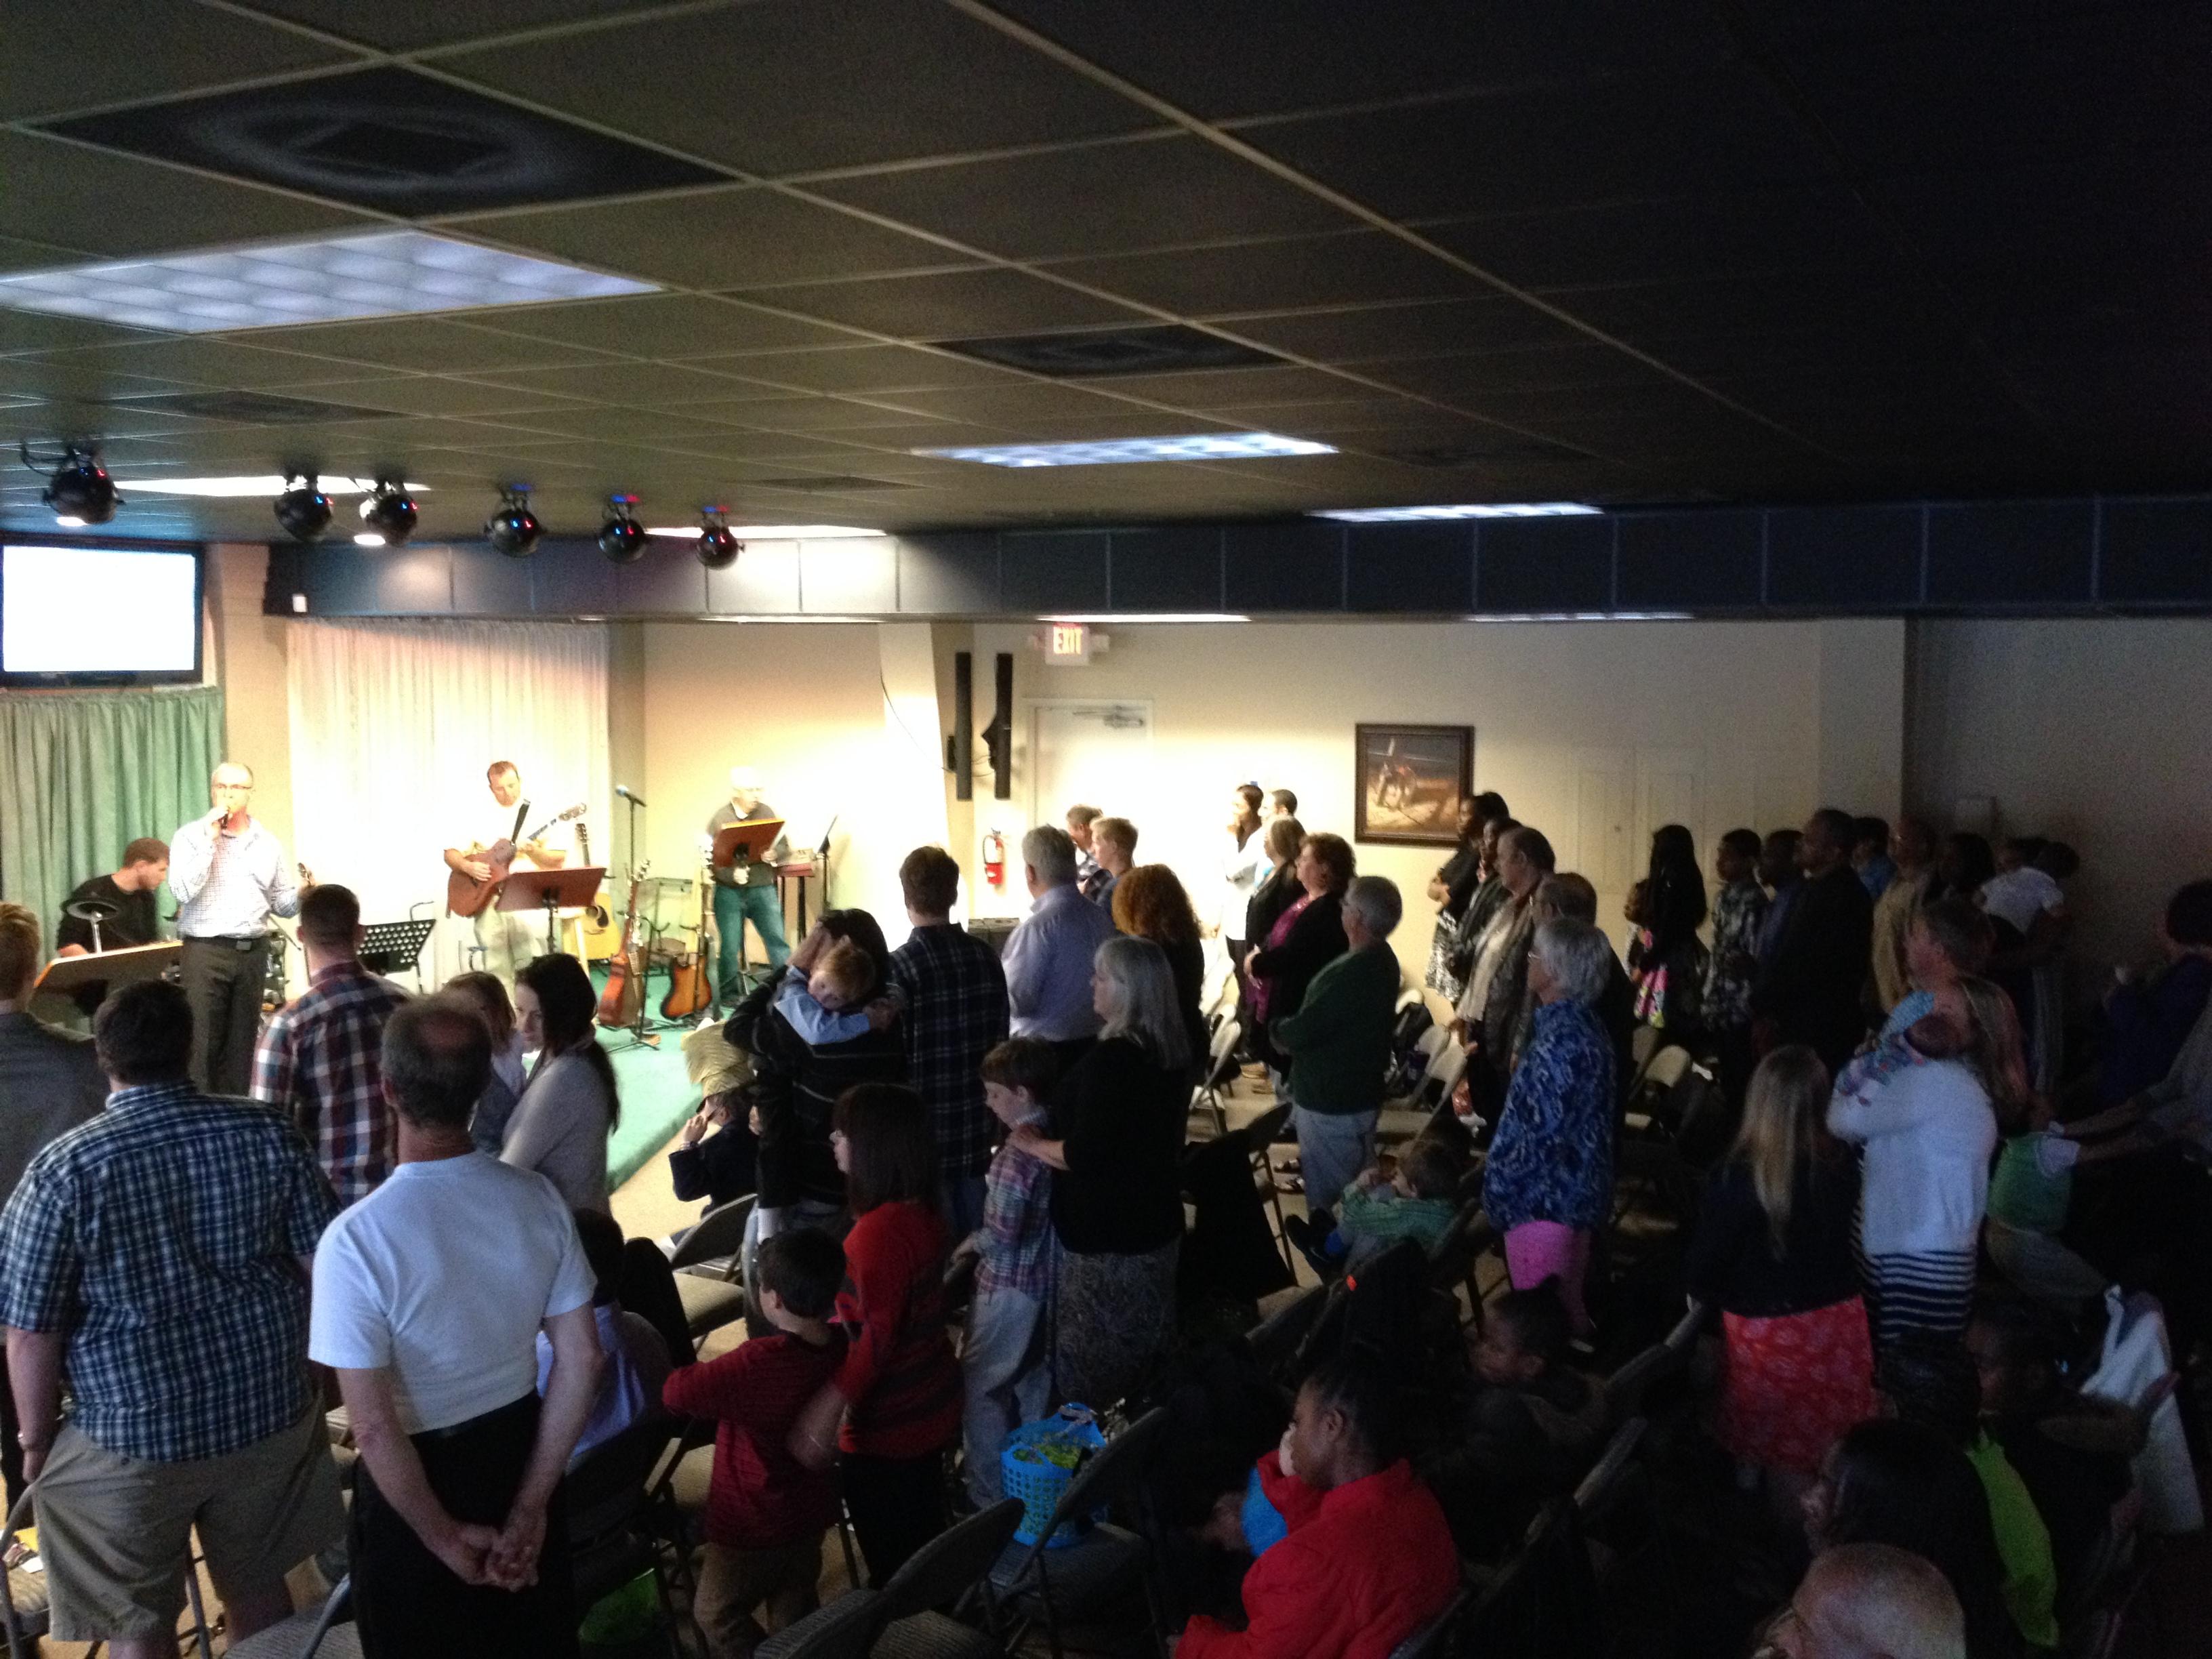 Glad Tidings Celebration and Faith Church image 3